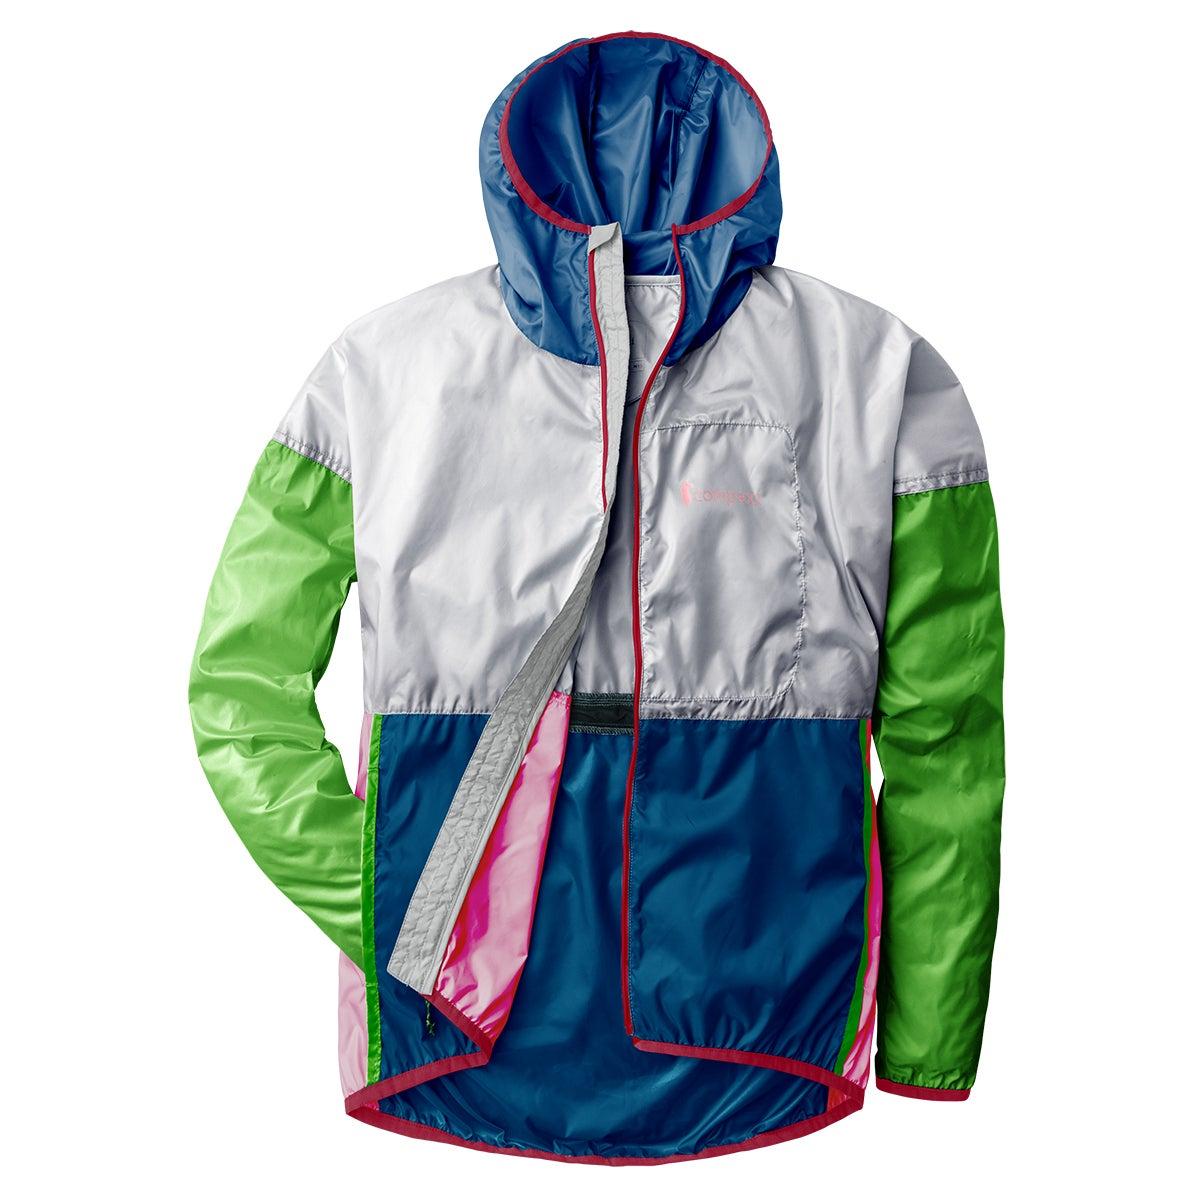 backcountry camping gear list: roanline jacket